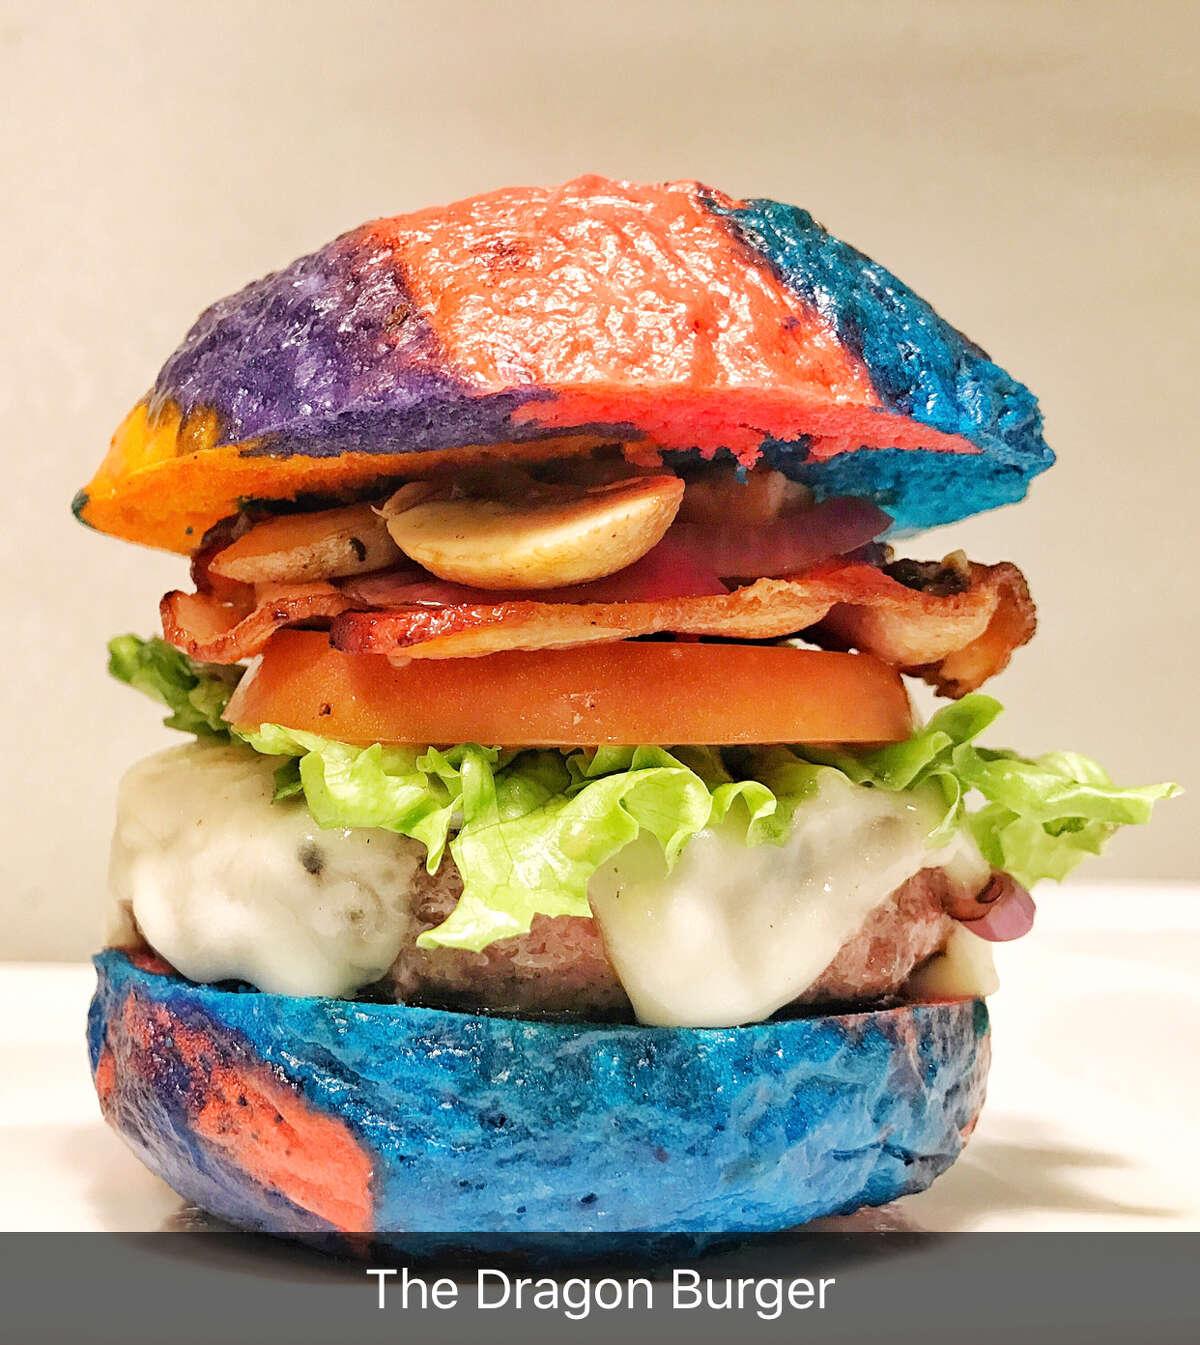 The Dragon Burger by chef Tatu Herrera of Tatu's Food Debauchery features a multi-colored pretzel bun, pickled mushrooms and chicharron aioli. Courtesy of Tatu Herrera